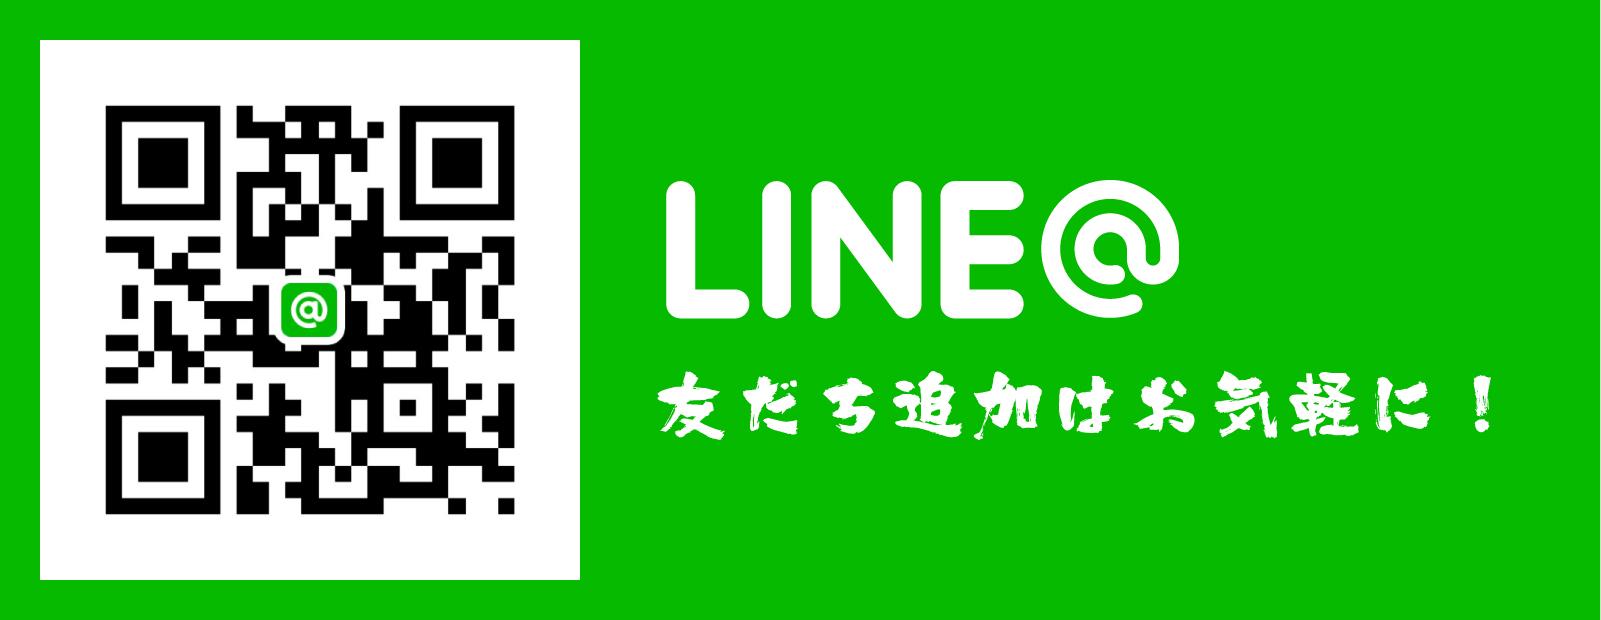 LINE@の友だち追加